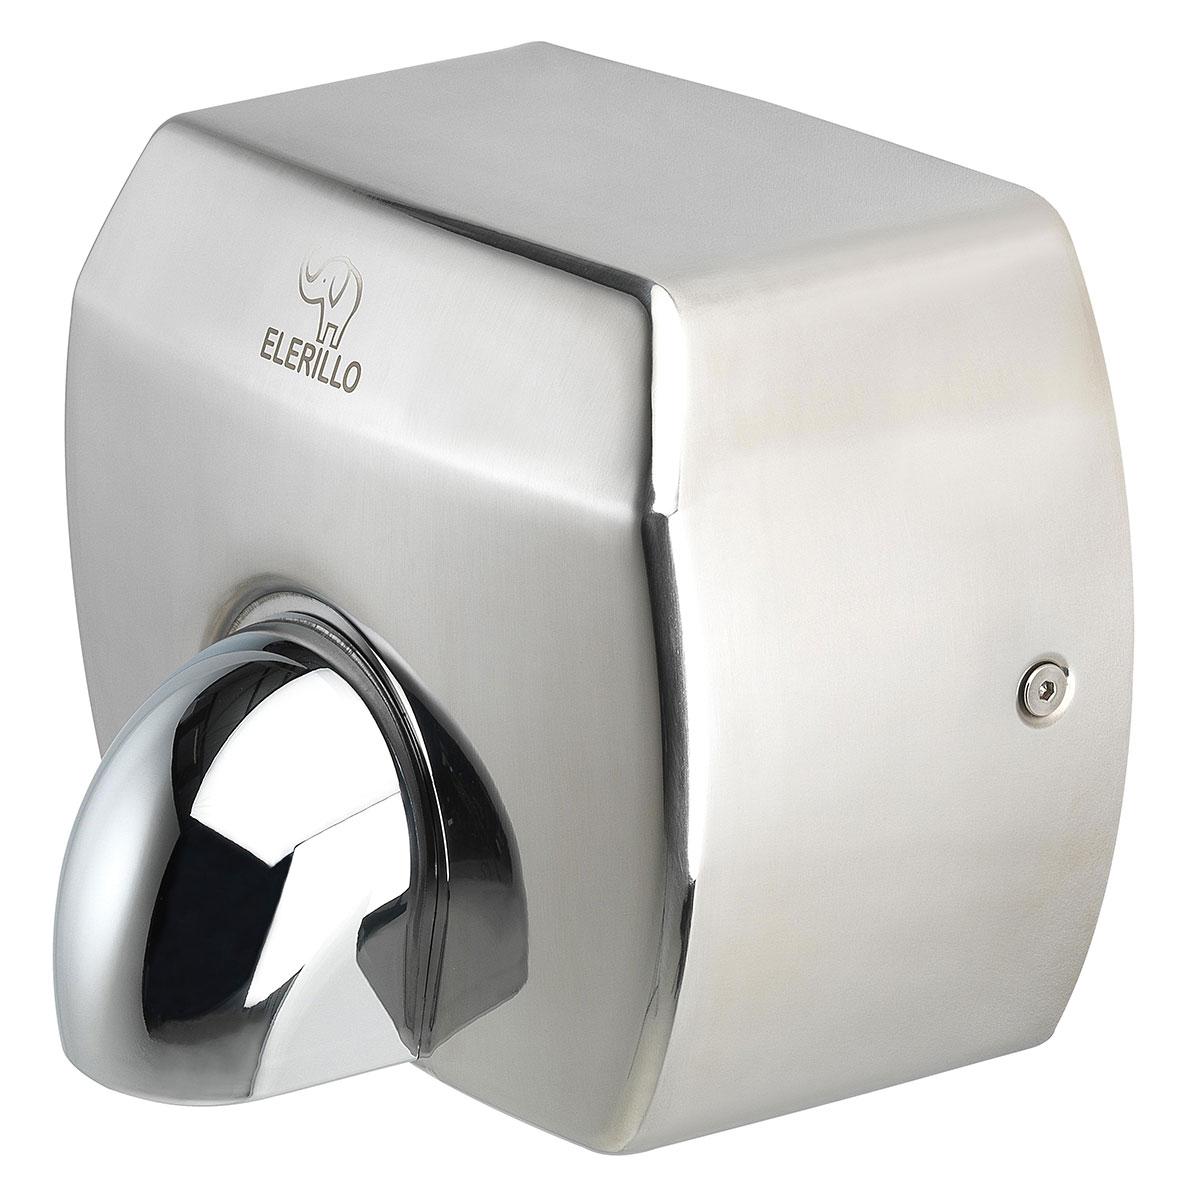 Elerillo Hand Dryer